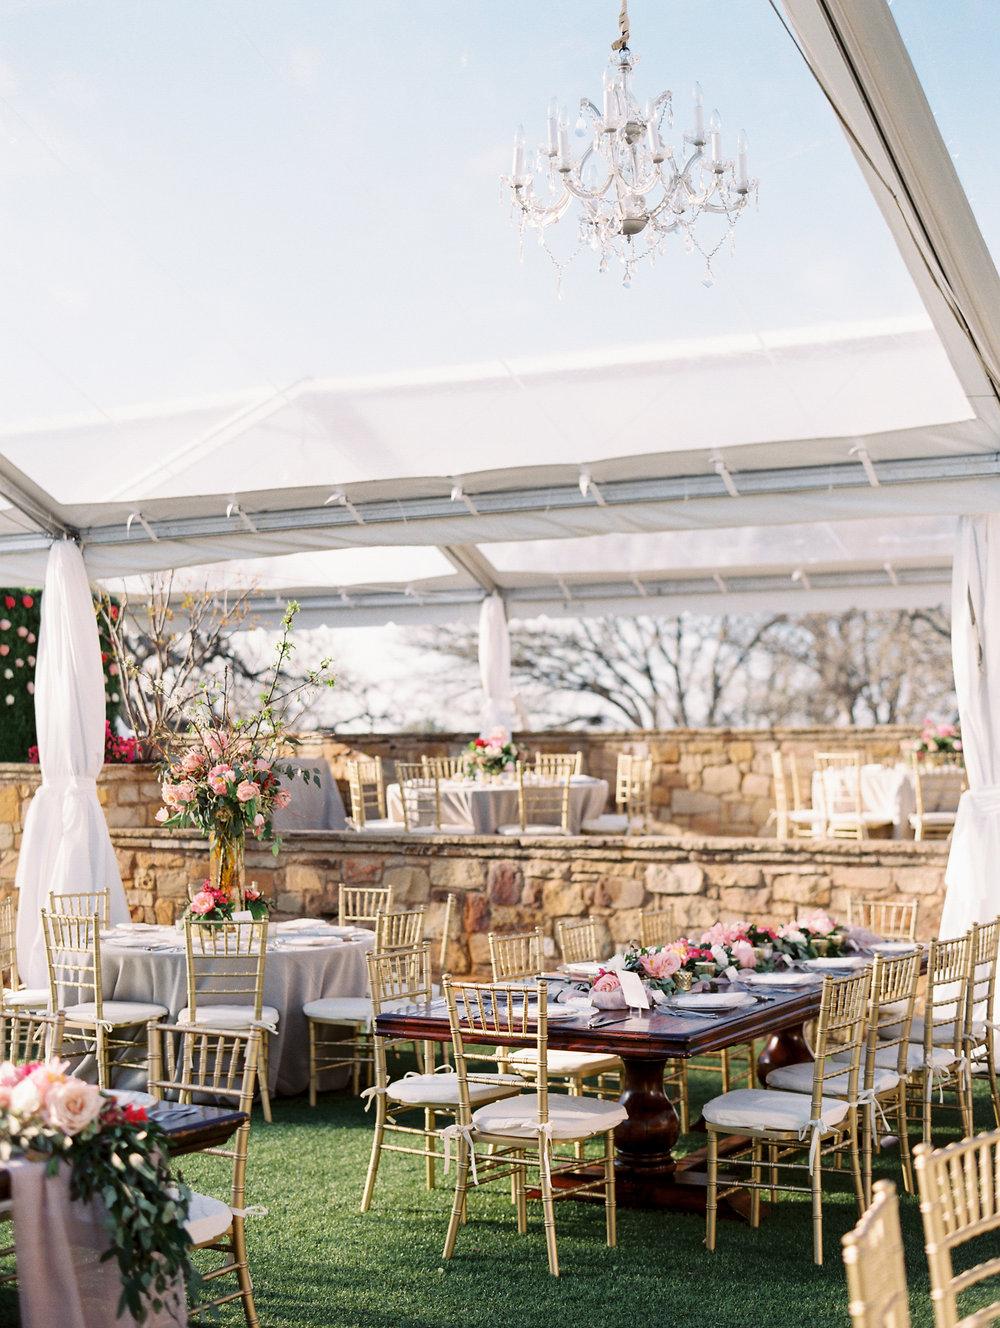 Escondido-Golf_Lake-Club-Hill-Country-Houston-Wedding-Photographer-Best-Top-Luxury-Destination-Engagements-Portrait-Austin-Photography-125.jpg